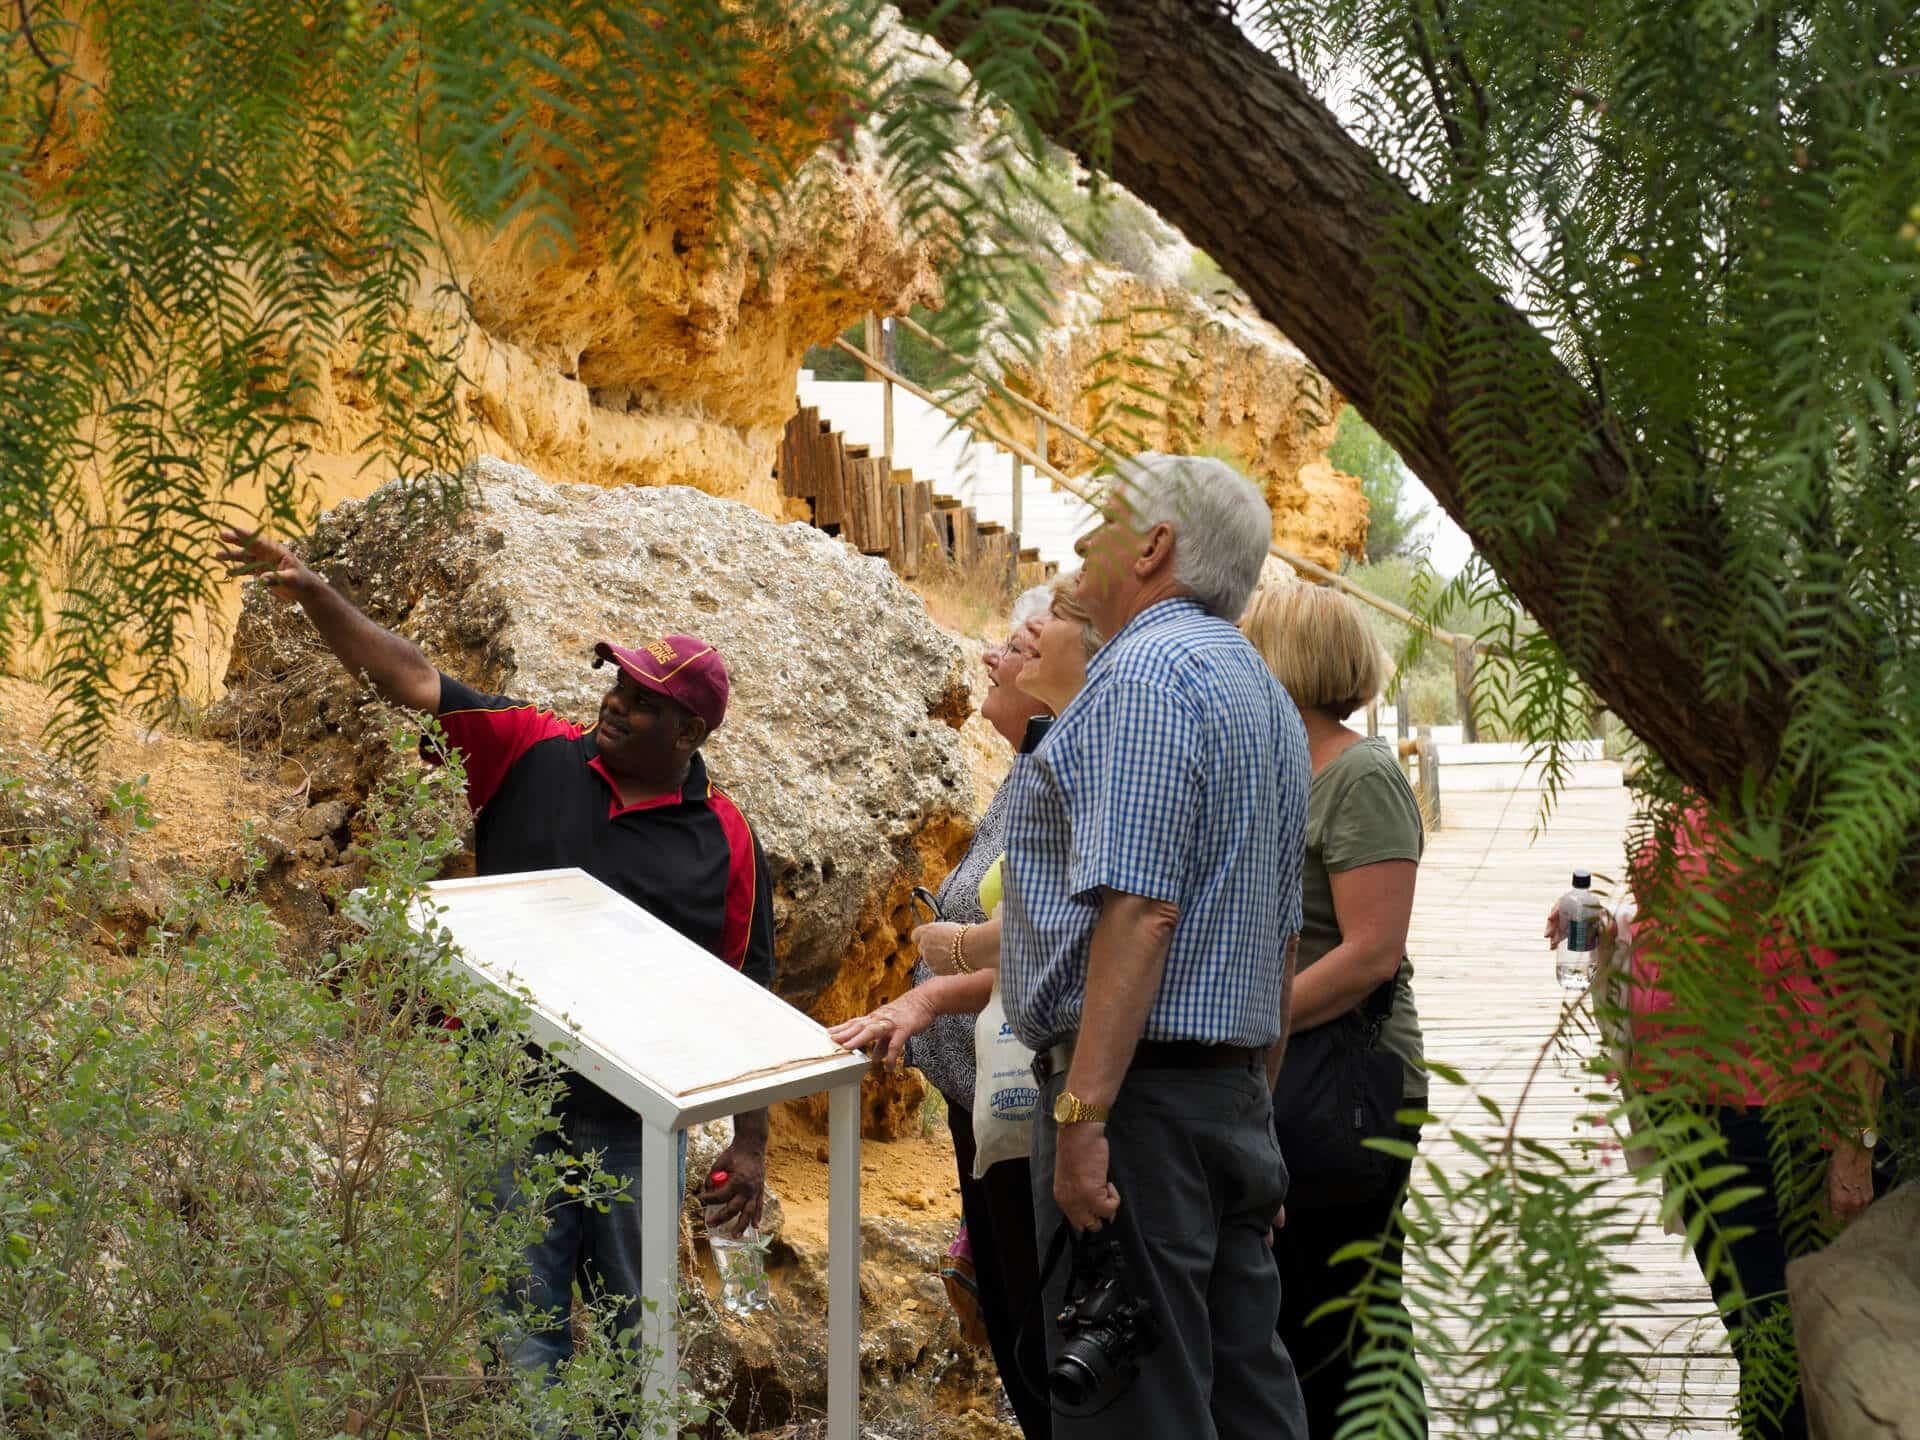 Guide takes group on tour of the Ngaut Ngaut Aboriginal Reserve